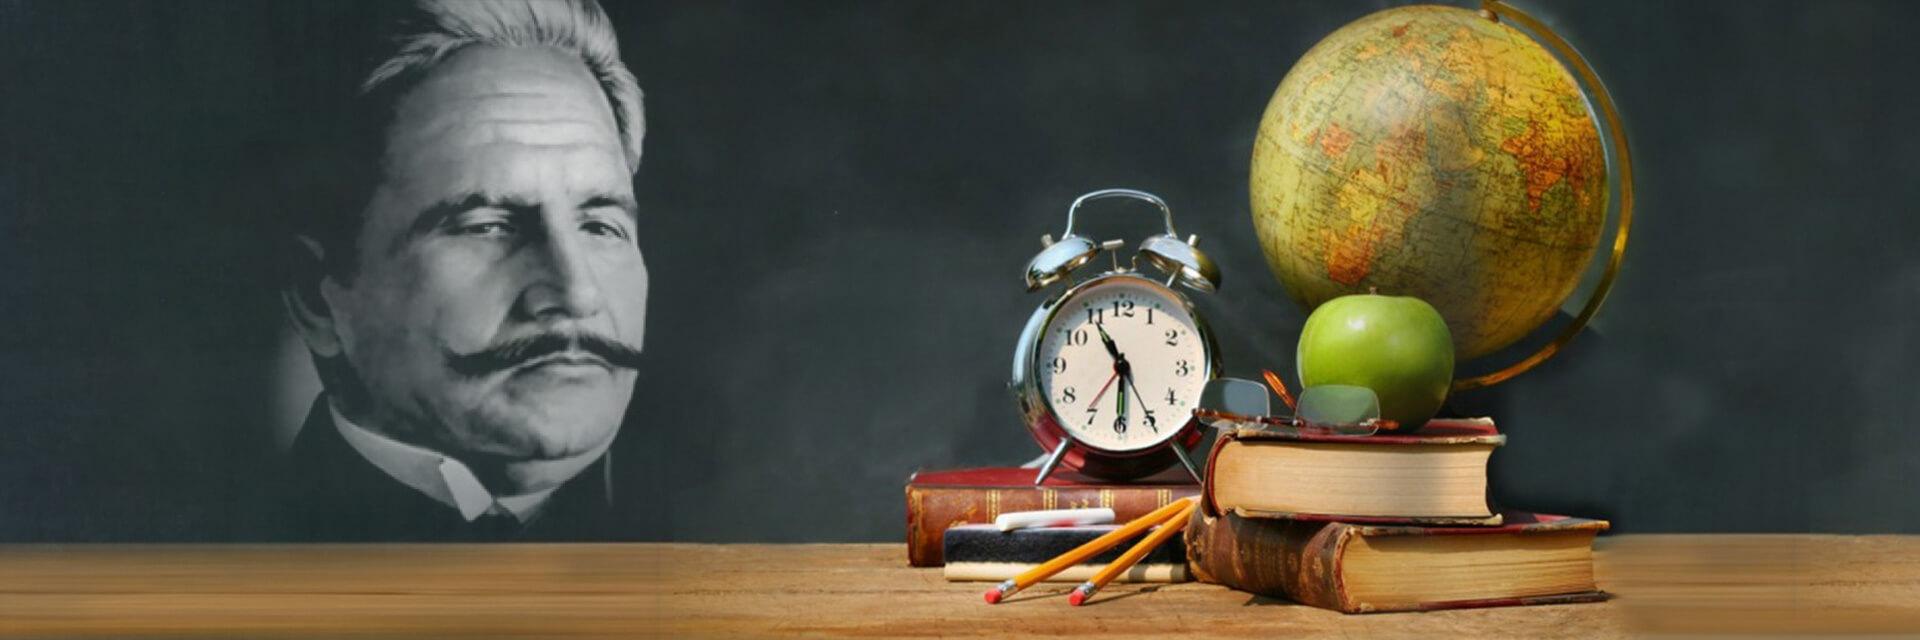 ALLAMA-IQBAL'S-MESSAGE-TO-TEACHERS-AND-EDUCATORS